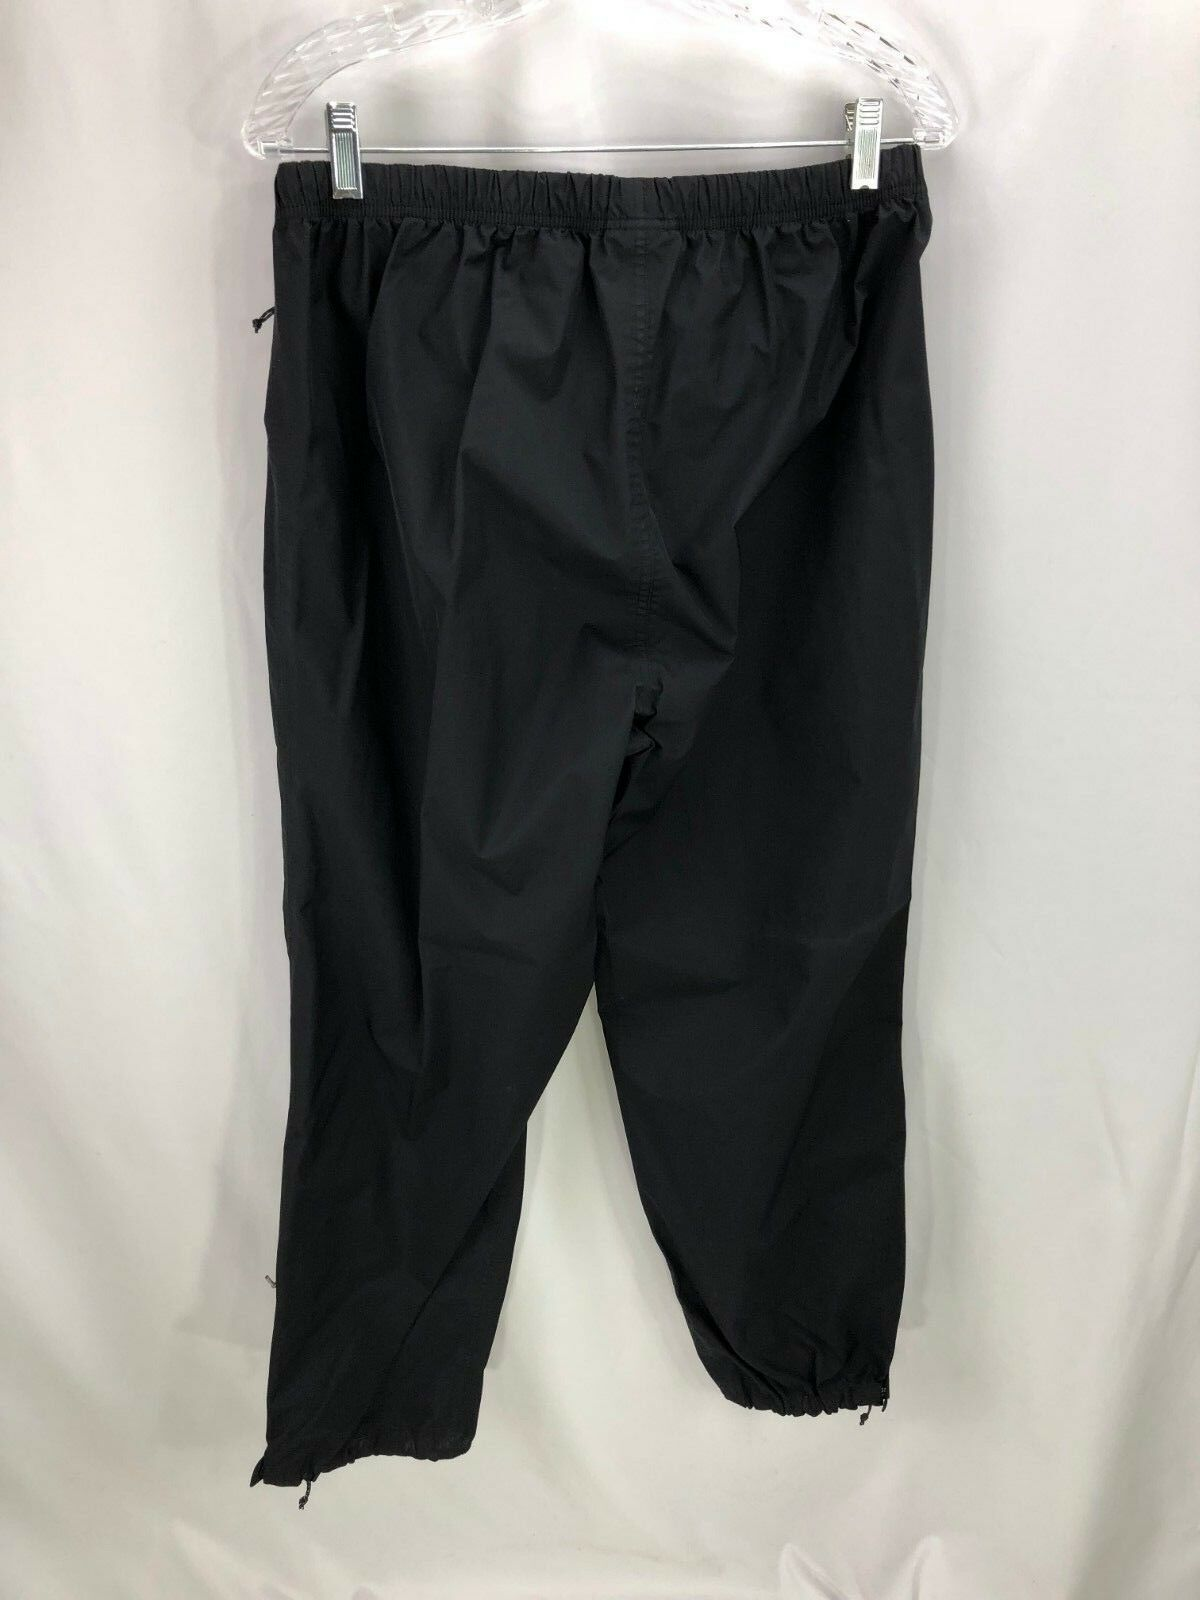 REI Lightweight Nylon Pants snowboard ski Men's L Black